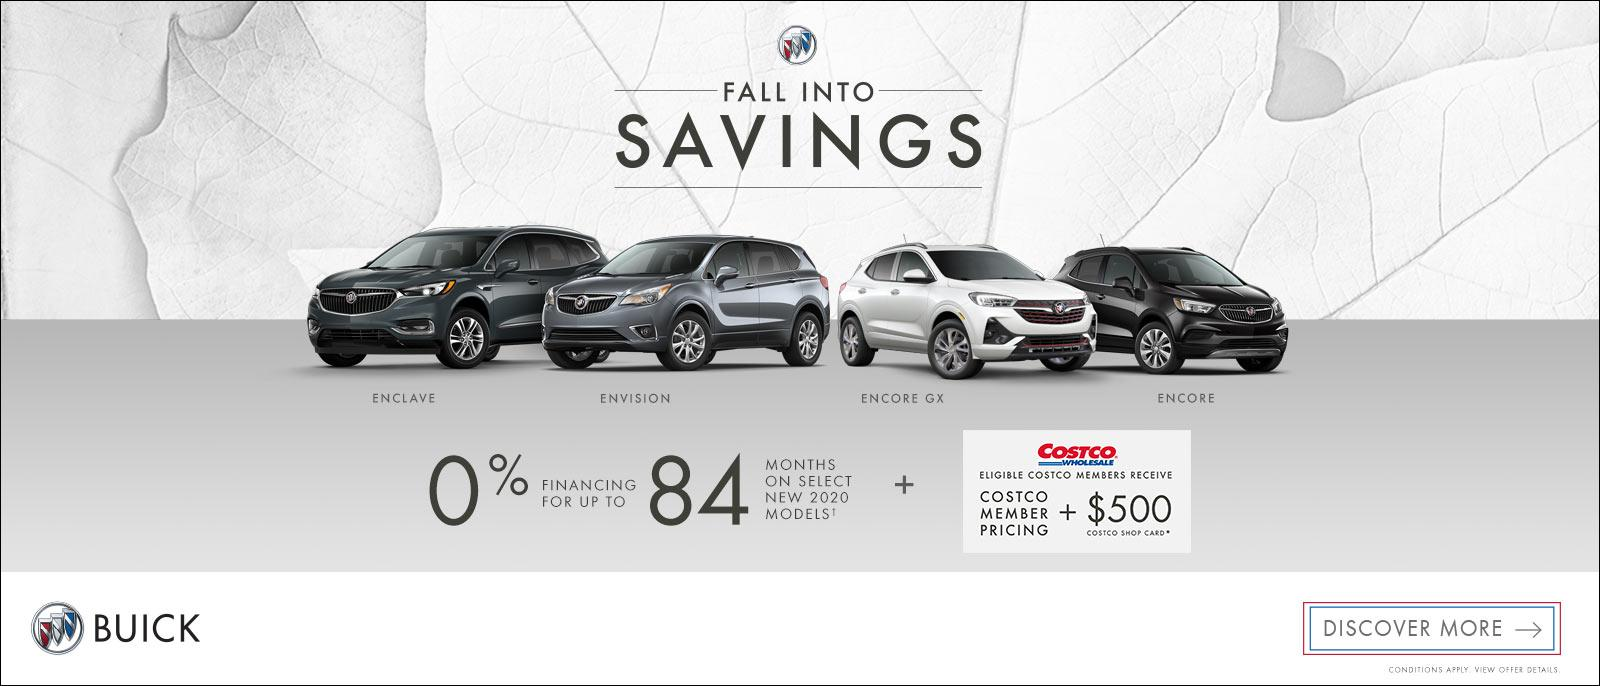 Fall Into Savings on Buick Vehicles